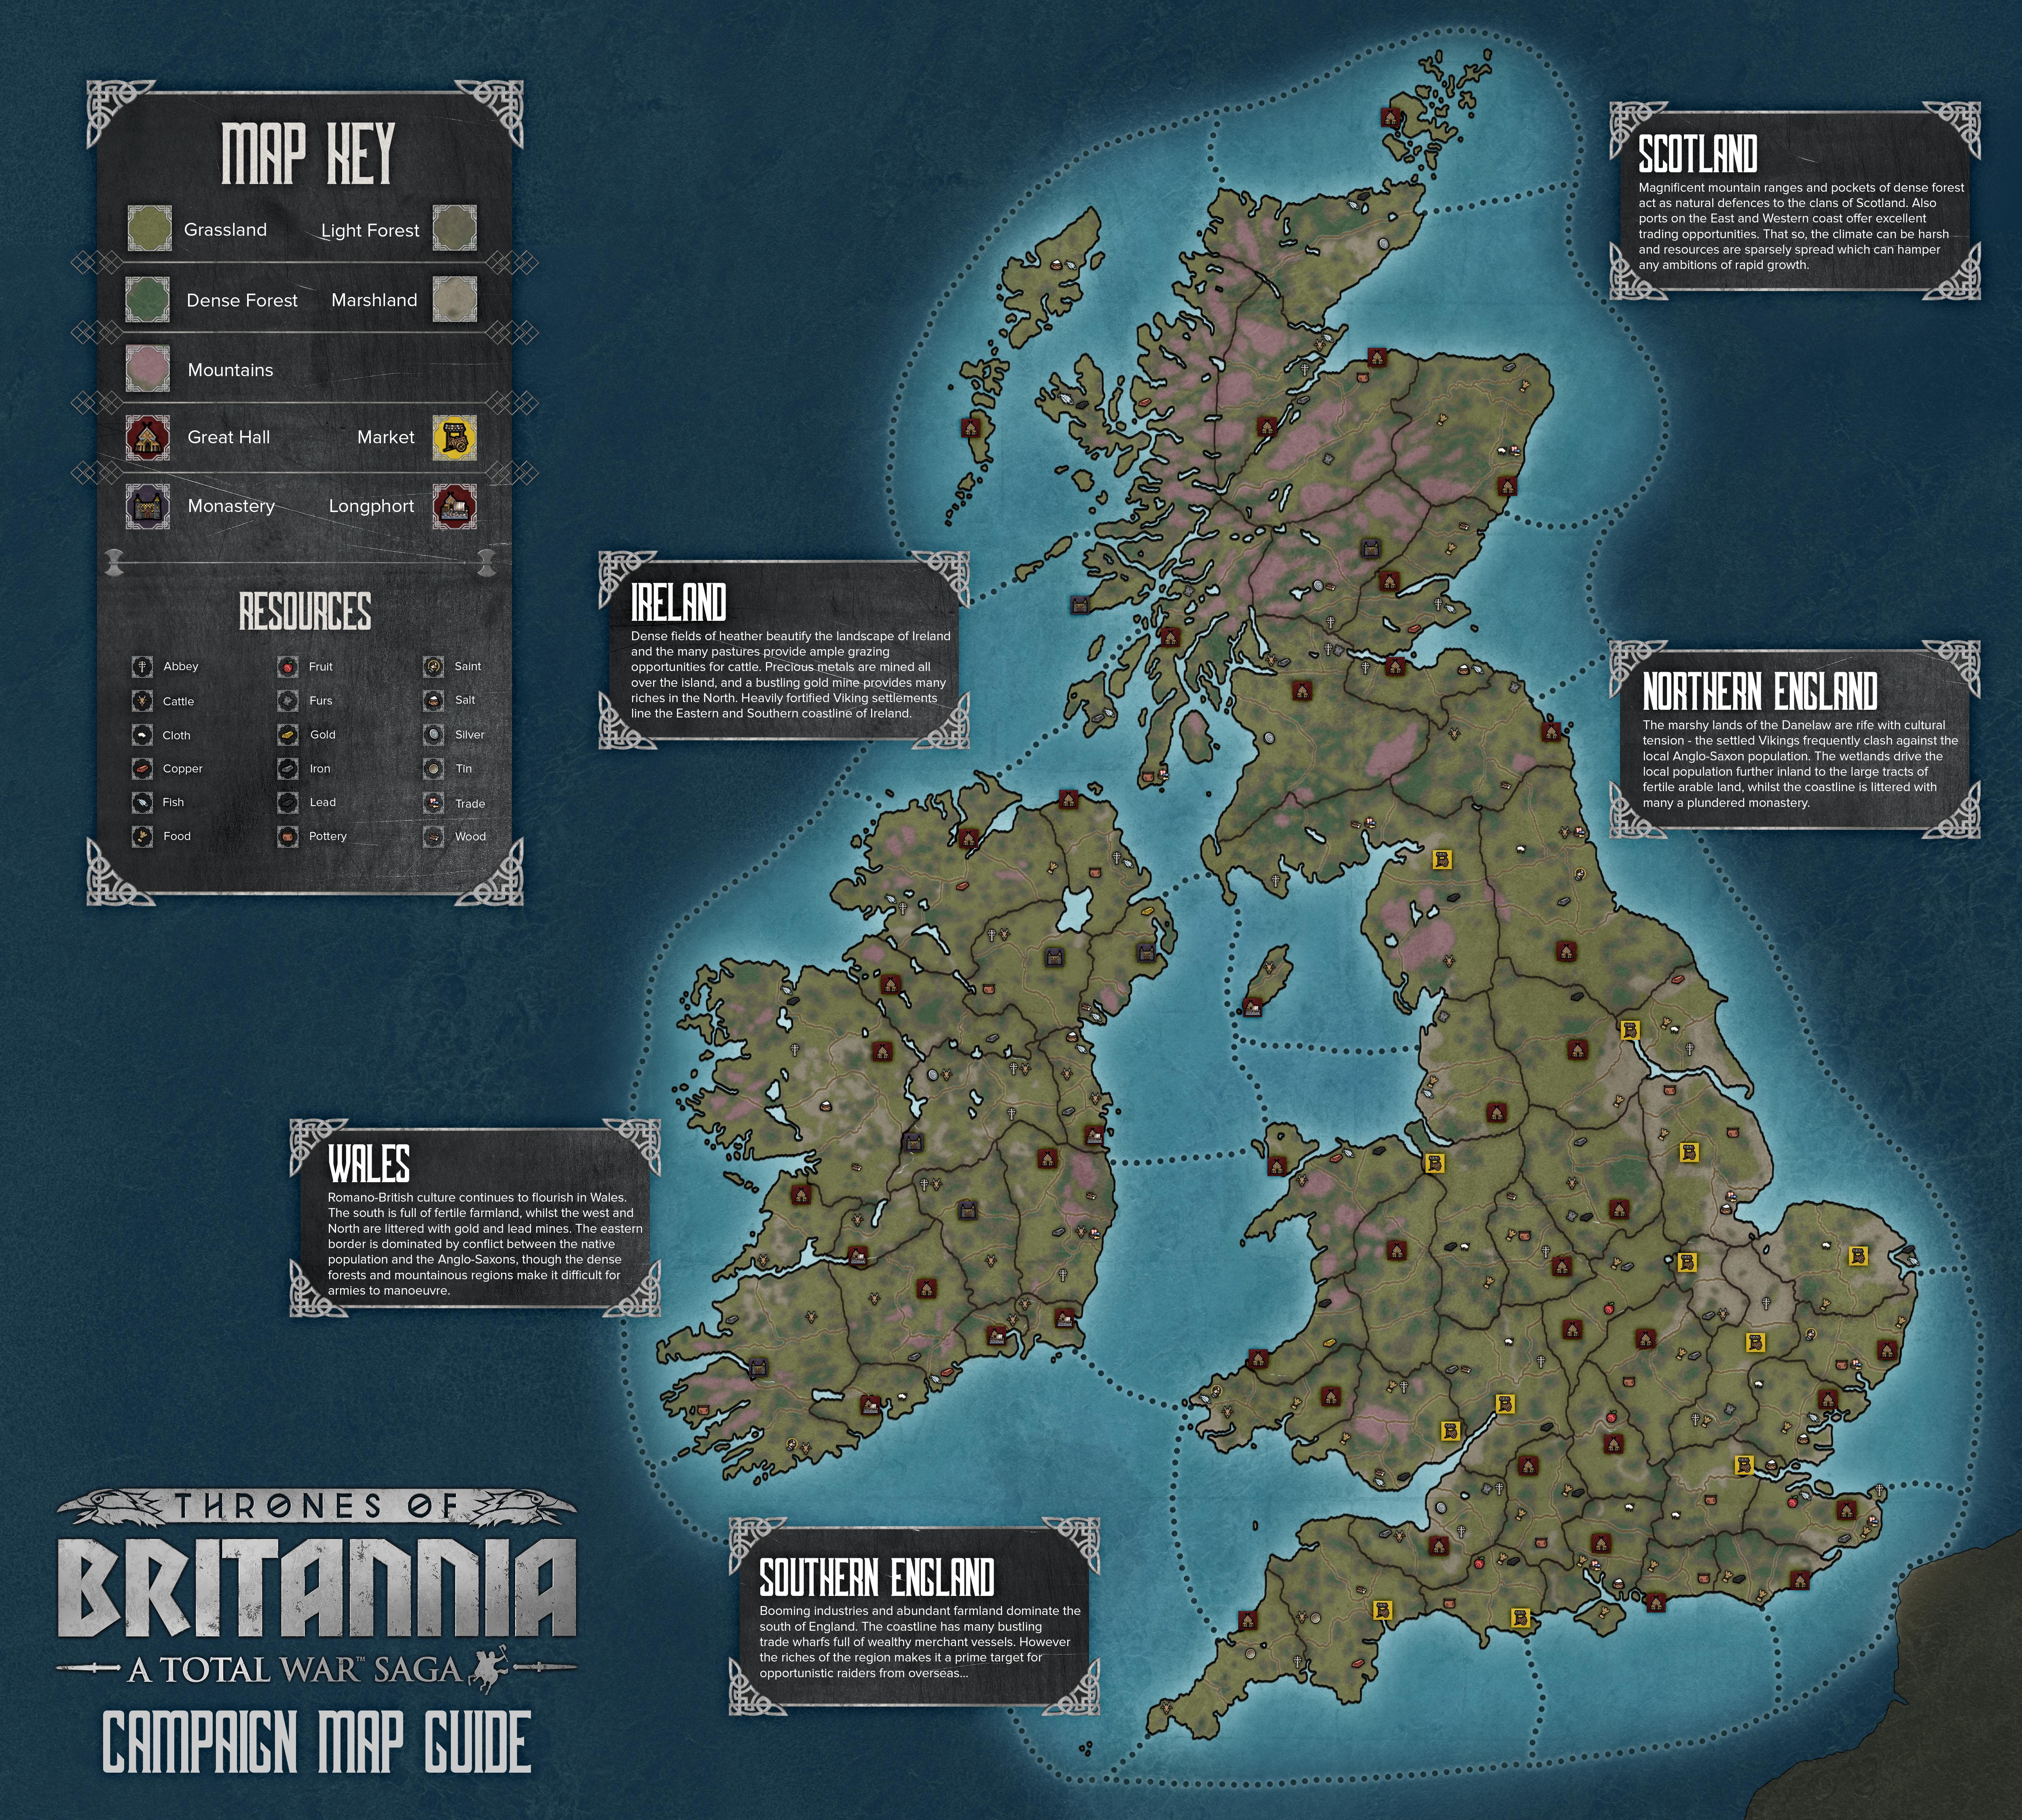 Thrones of Britannia - Campaign Map Reveal - Total War